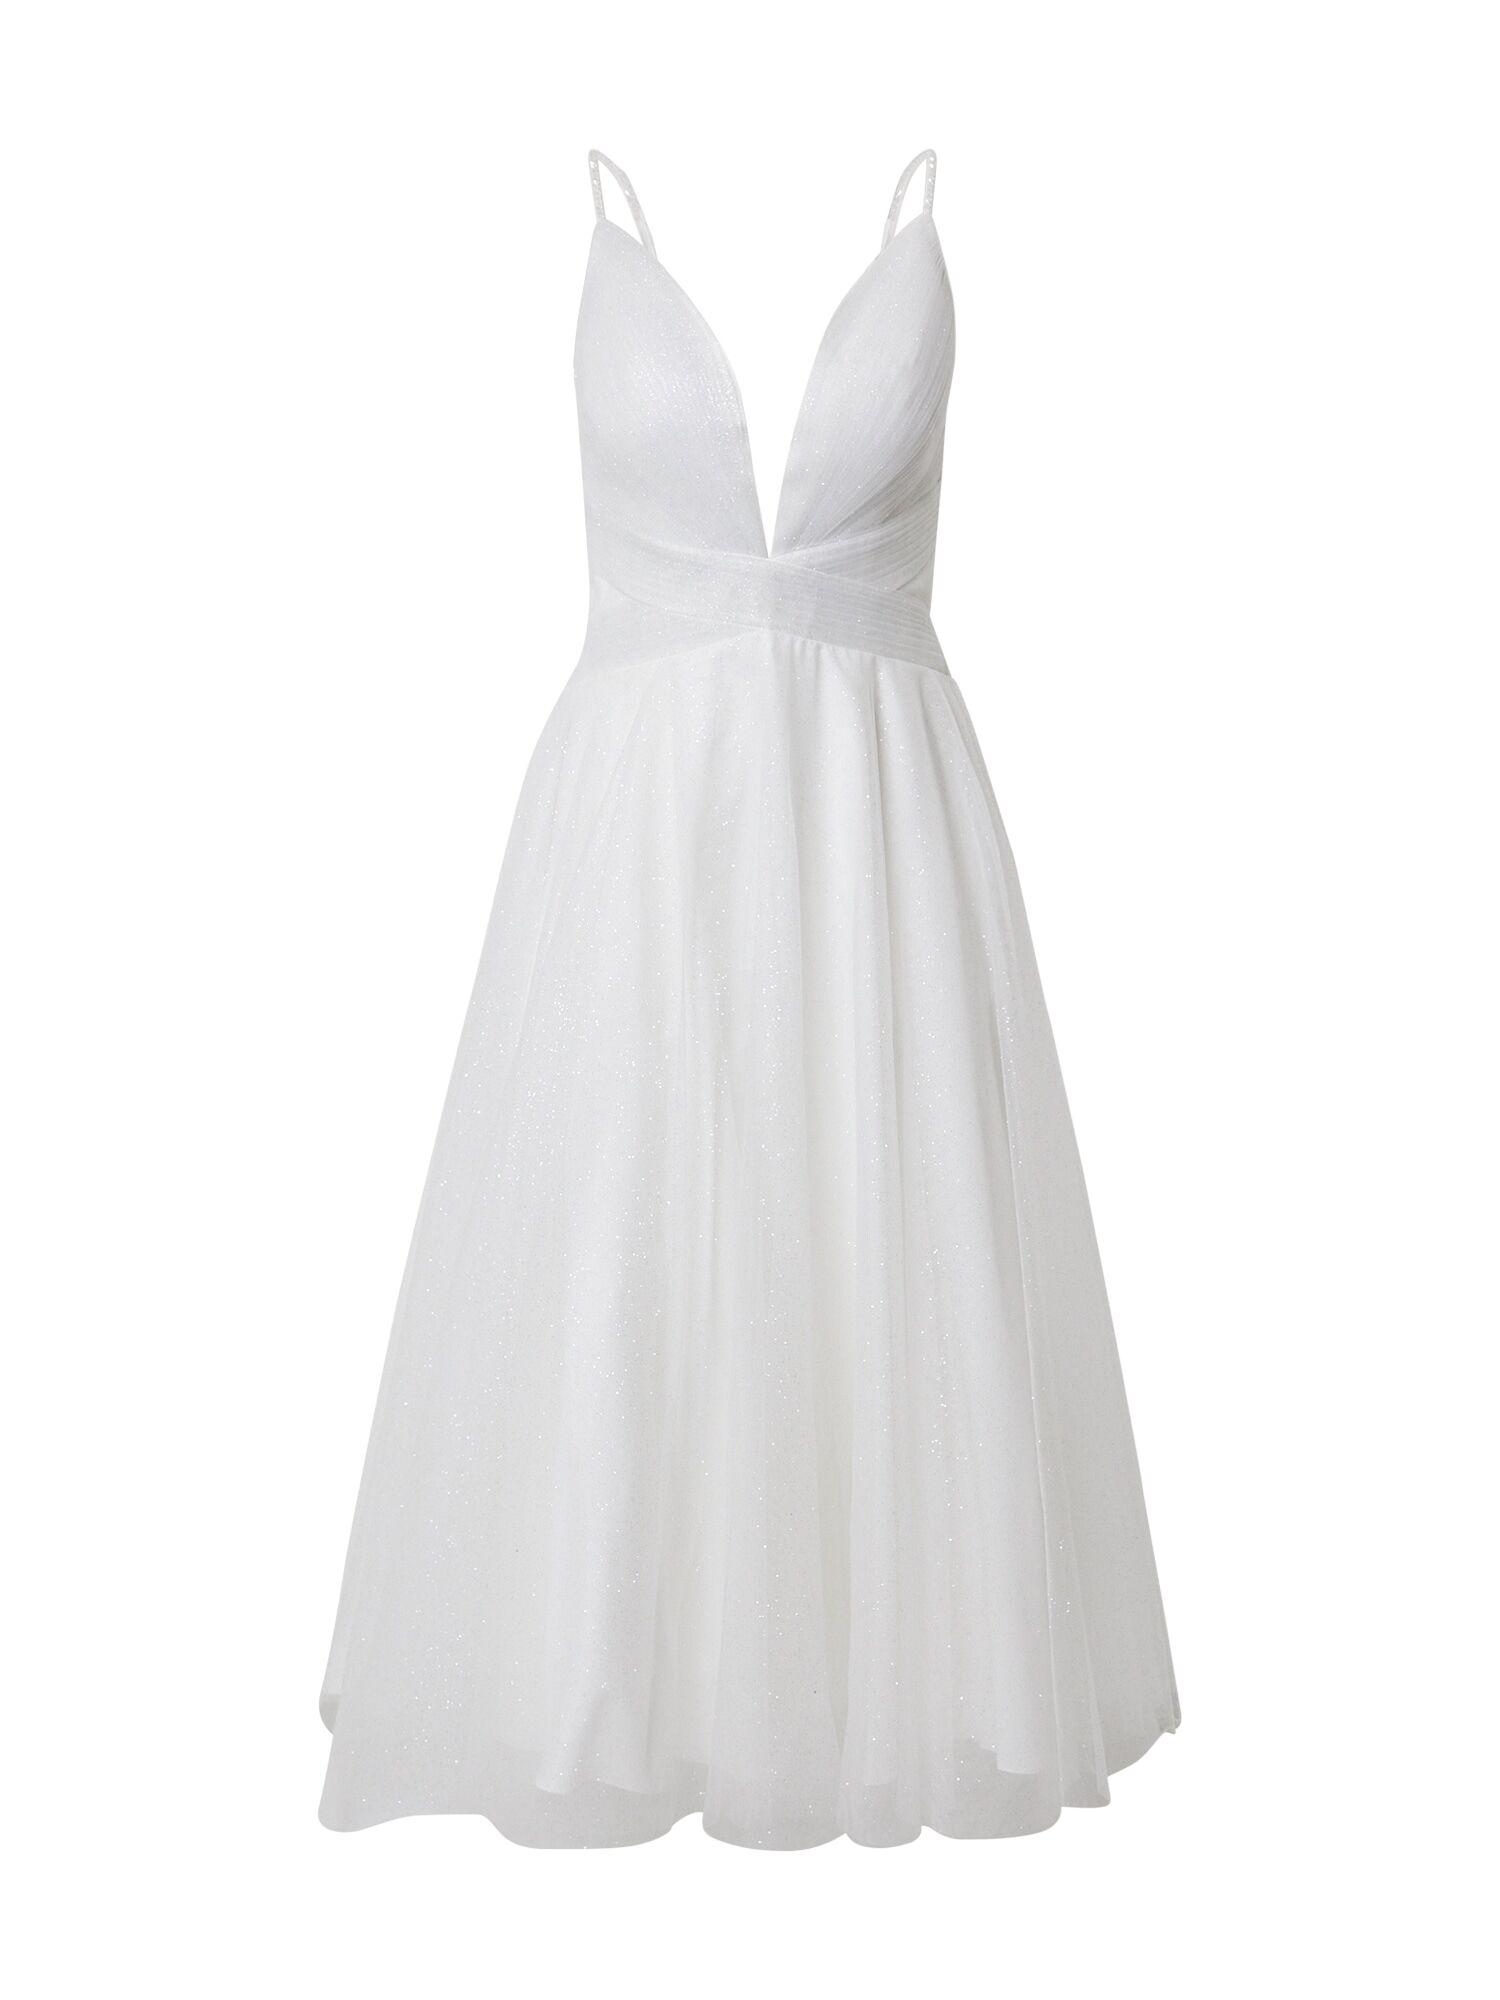 mascara Robe de soirée  - Blanc - Taille: 38 - female